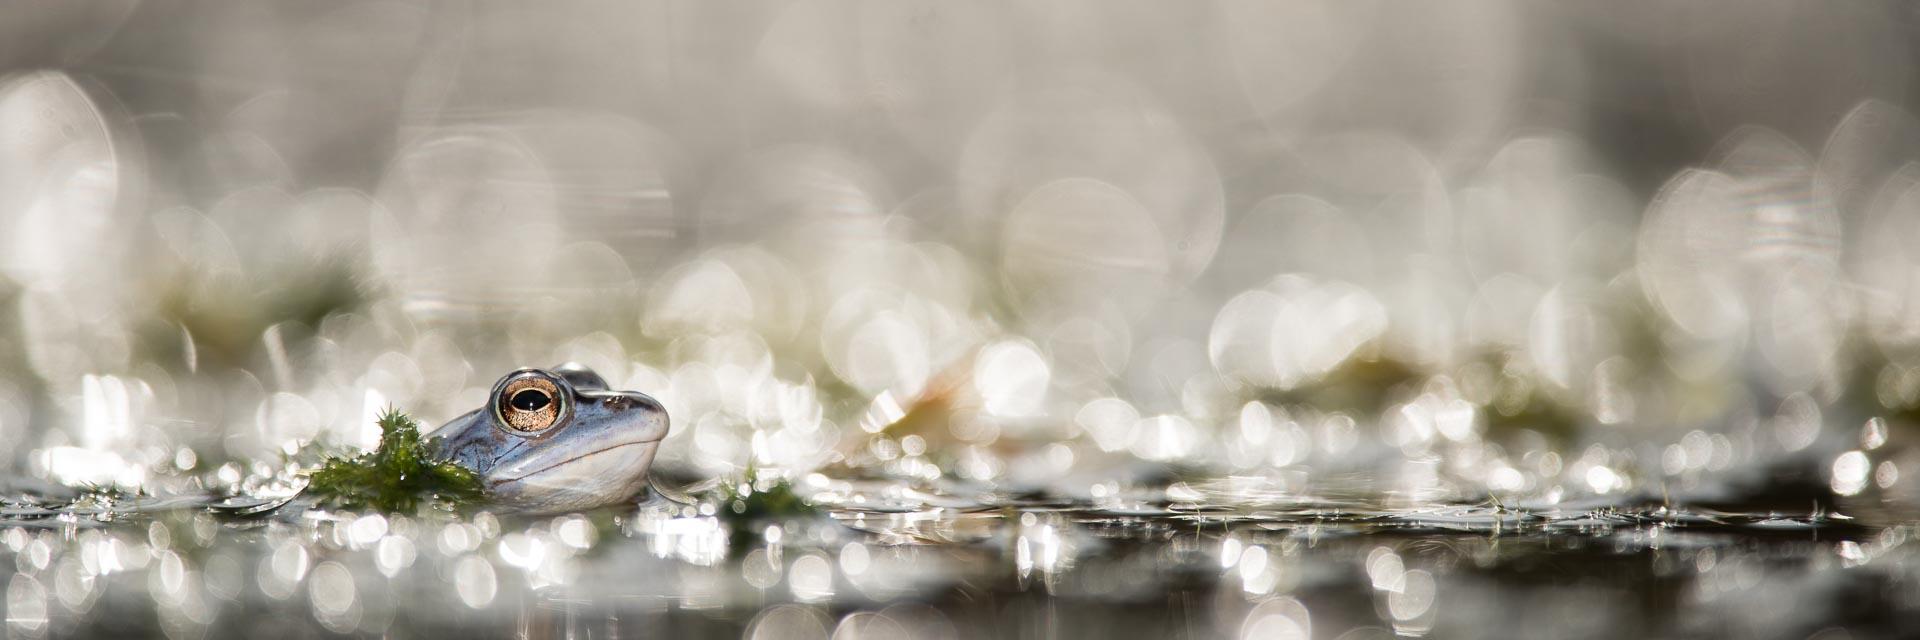 Paul van Hoof Nature Photography